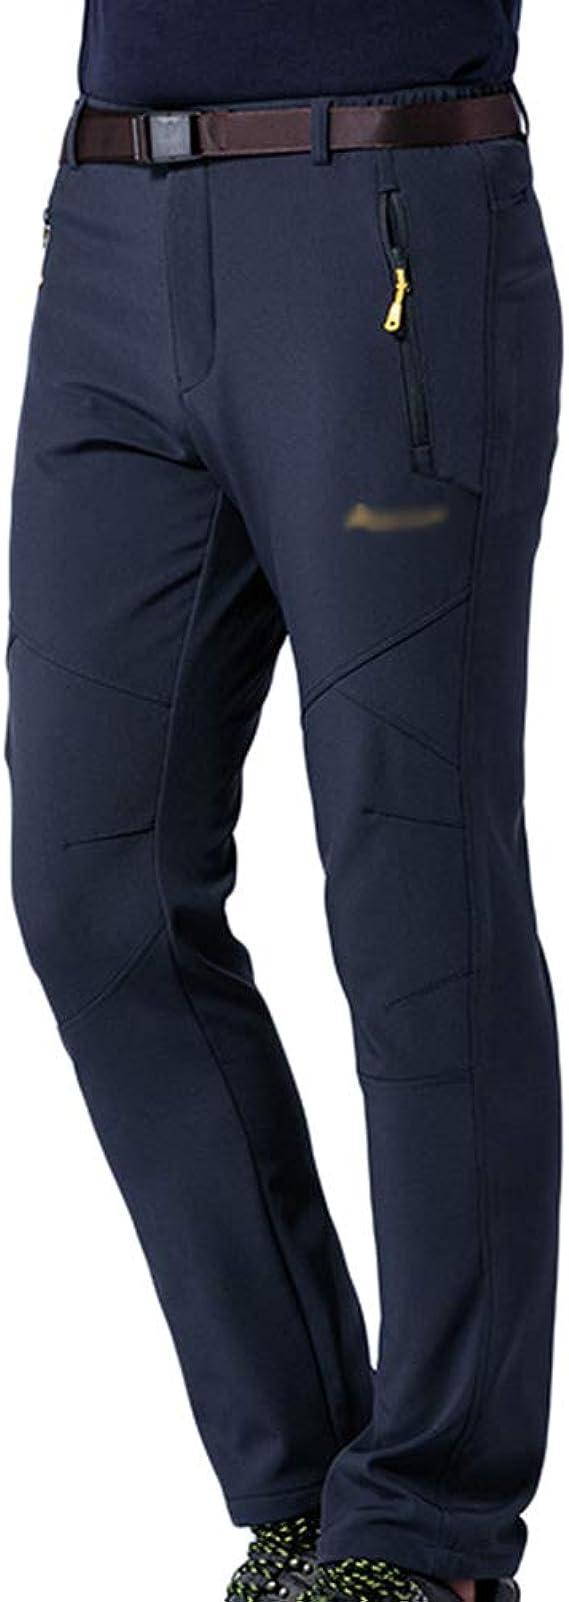 Tookang Pantalones De Trekking Softshell Pantalones Impermeables Resistente Pantalones De Escalada Ropa Deportiva Pareja Lana Transpirable